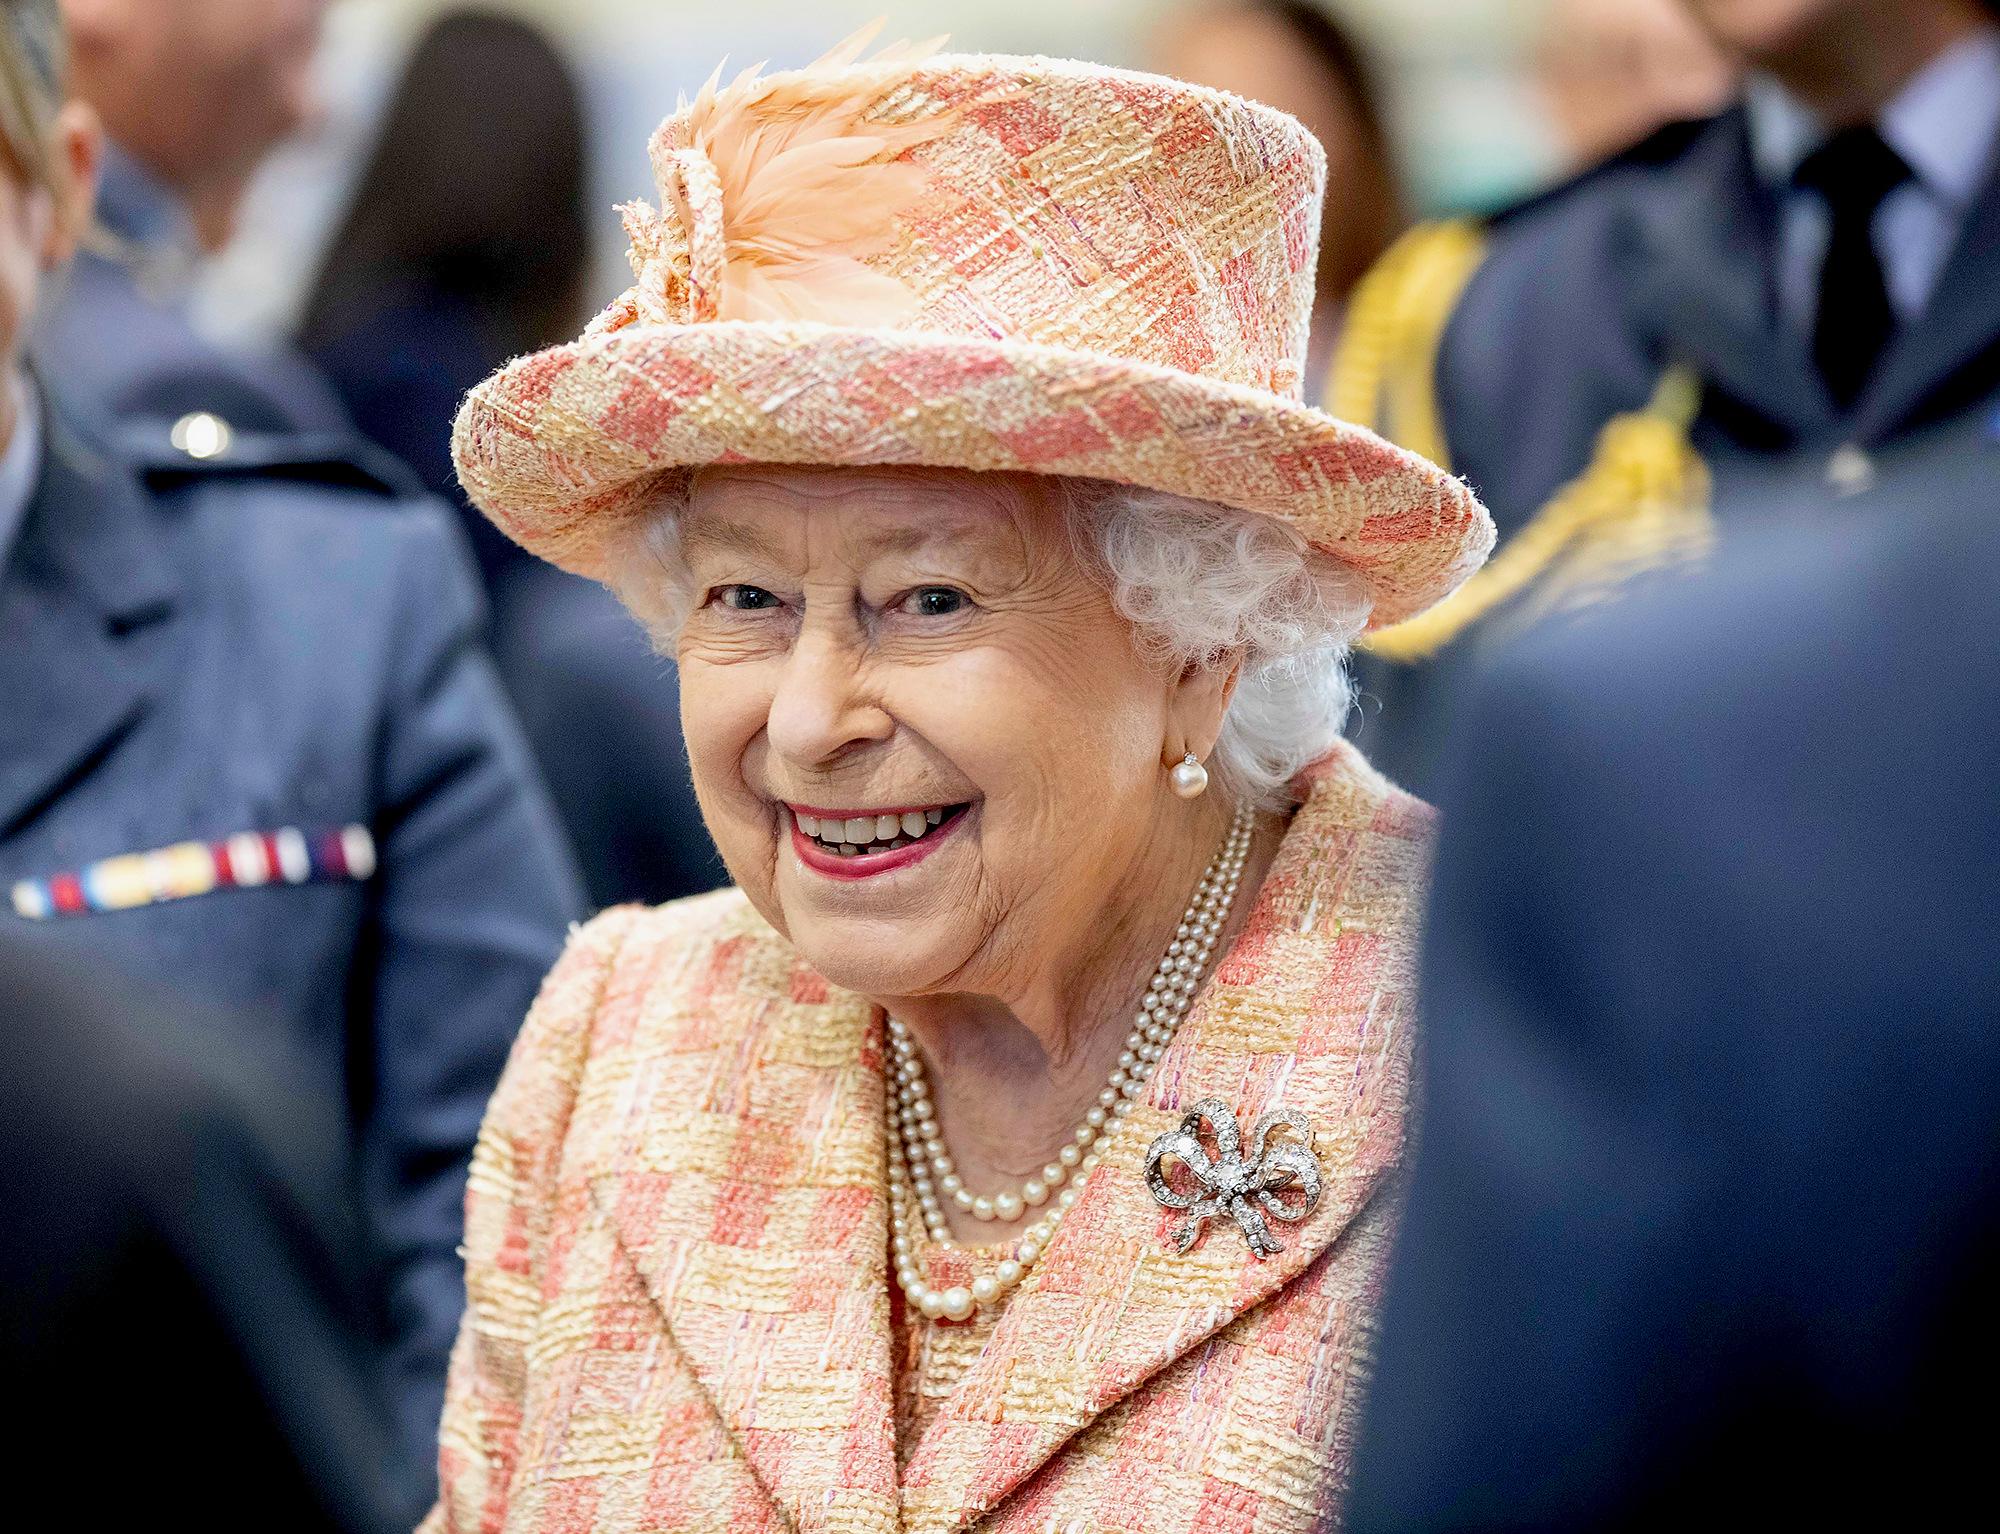 Queen Elizabeth Has Chocolate Cake For Her Birthday Each Year